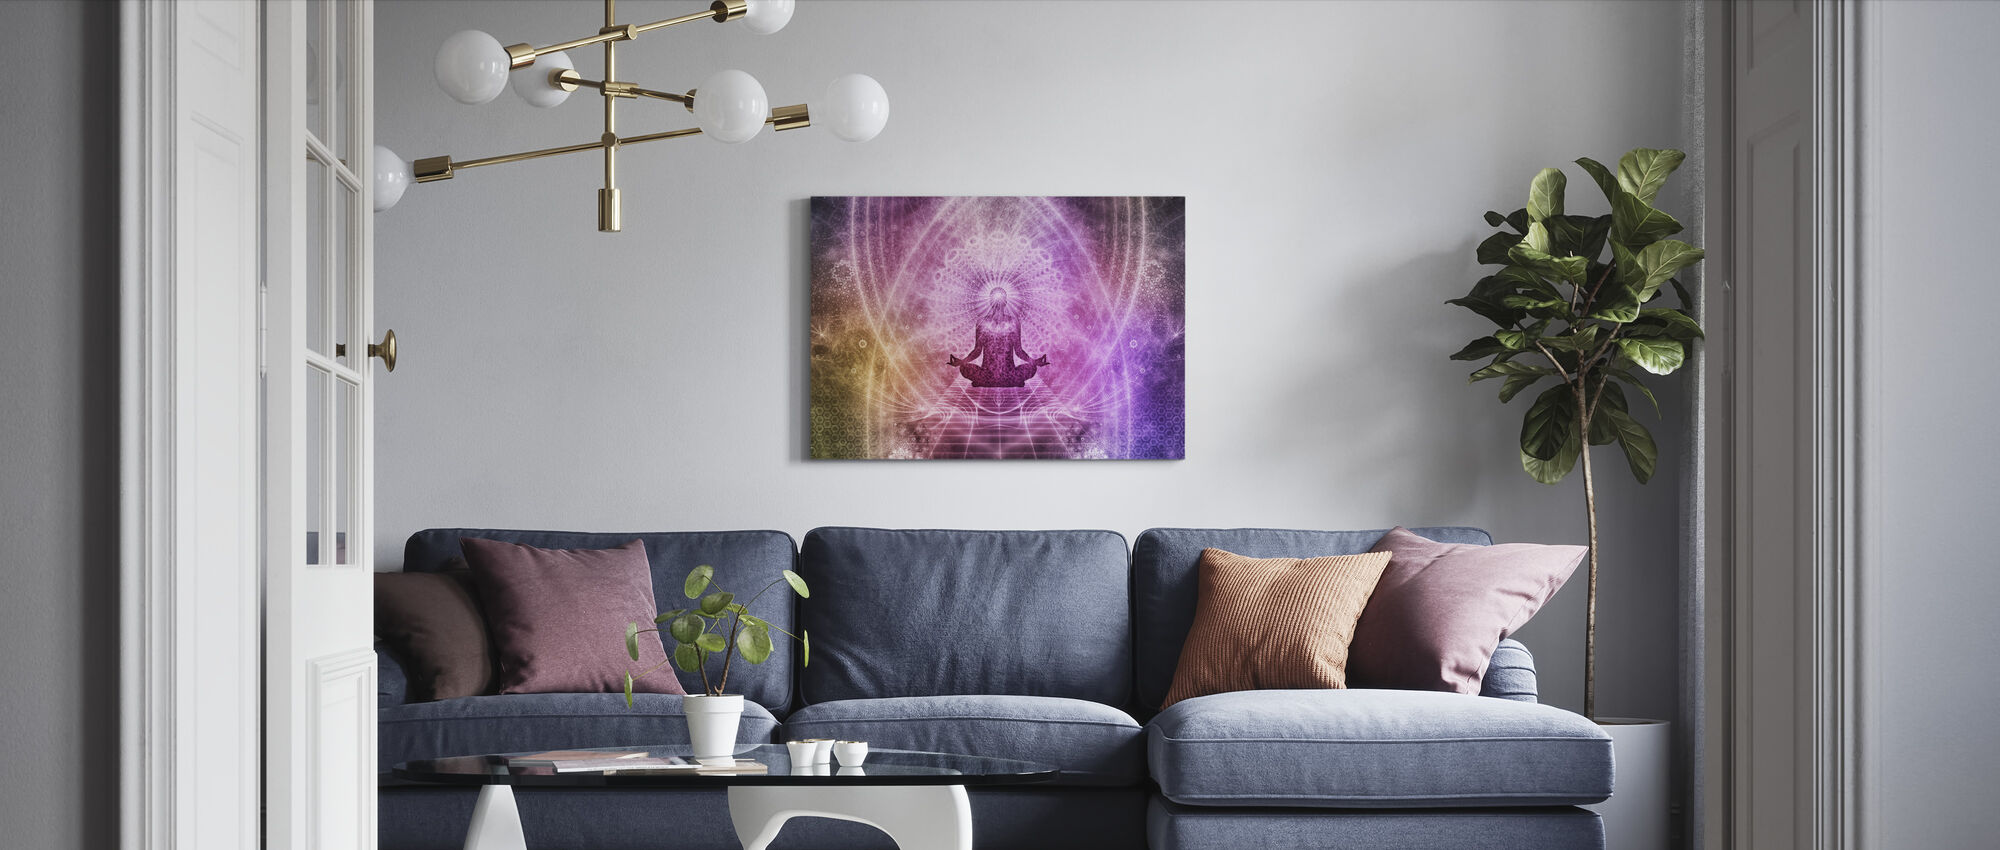 Spirituele Meditatie - Canvas print - Woonkamer